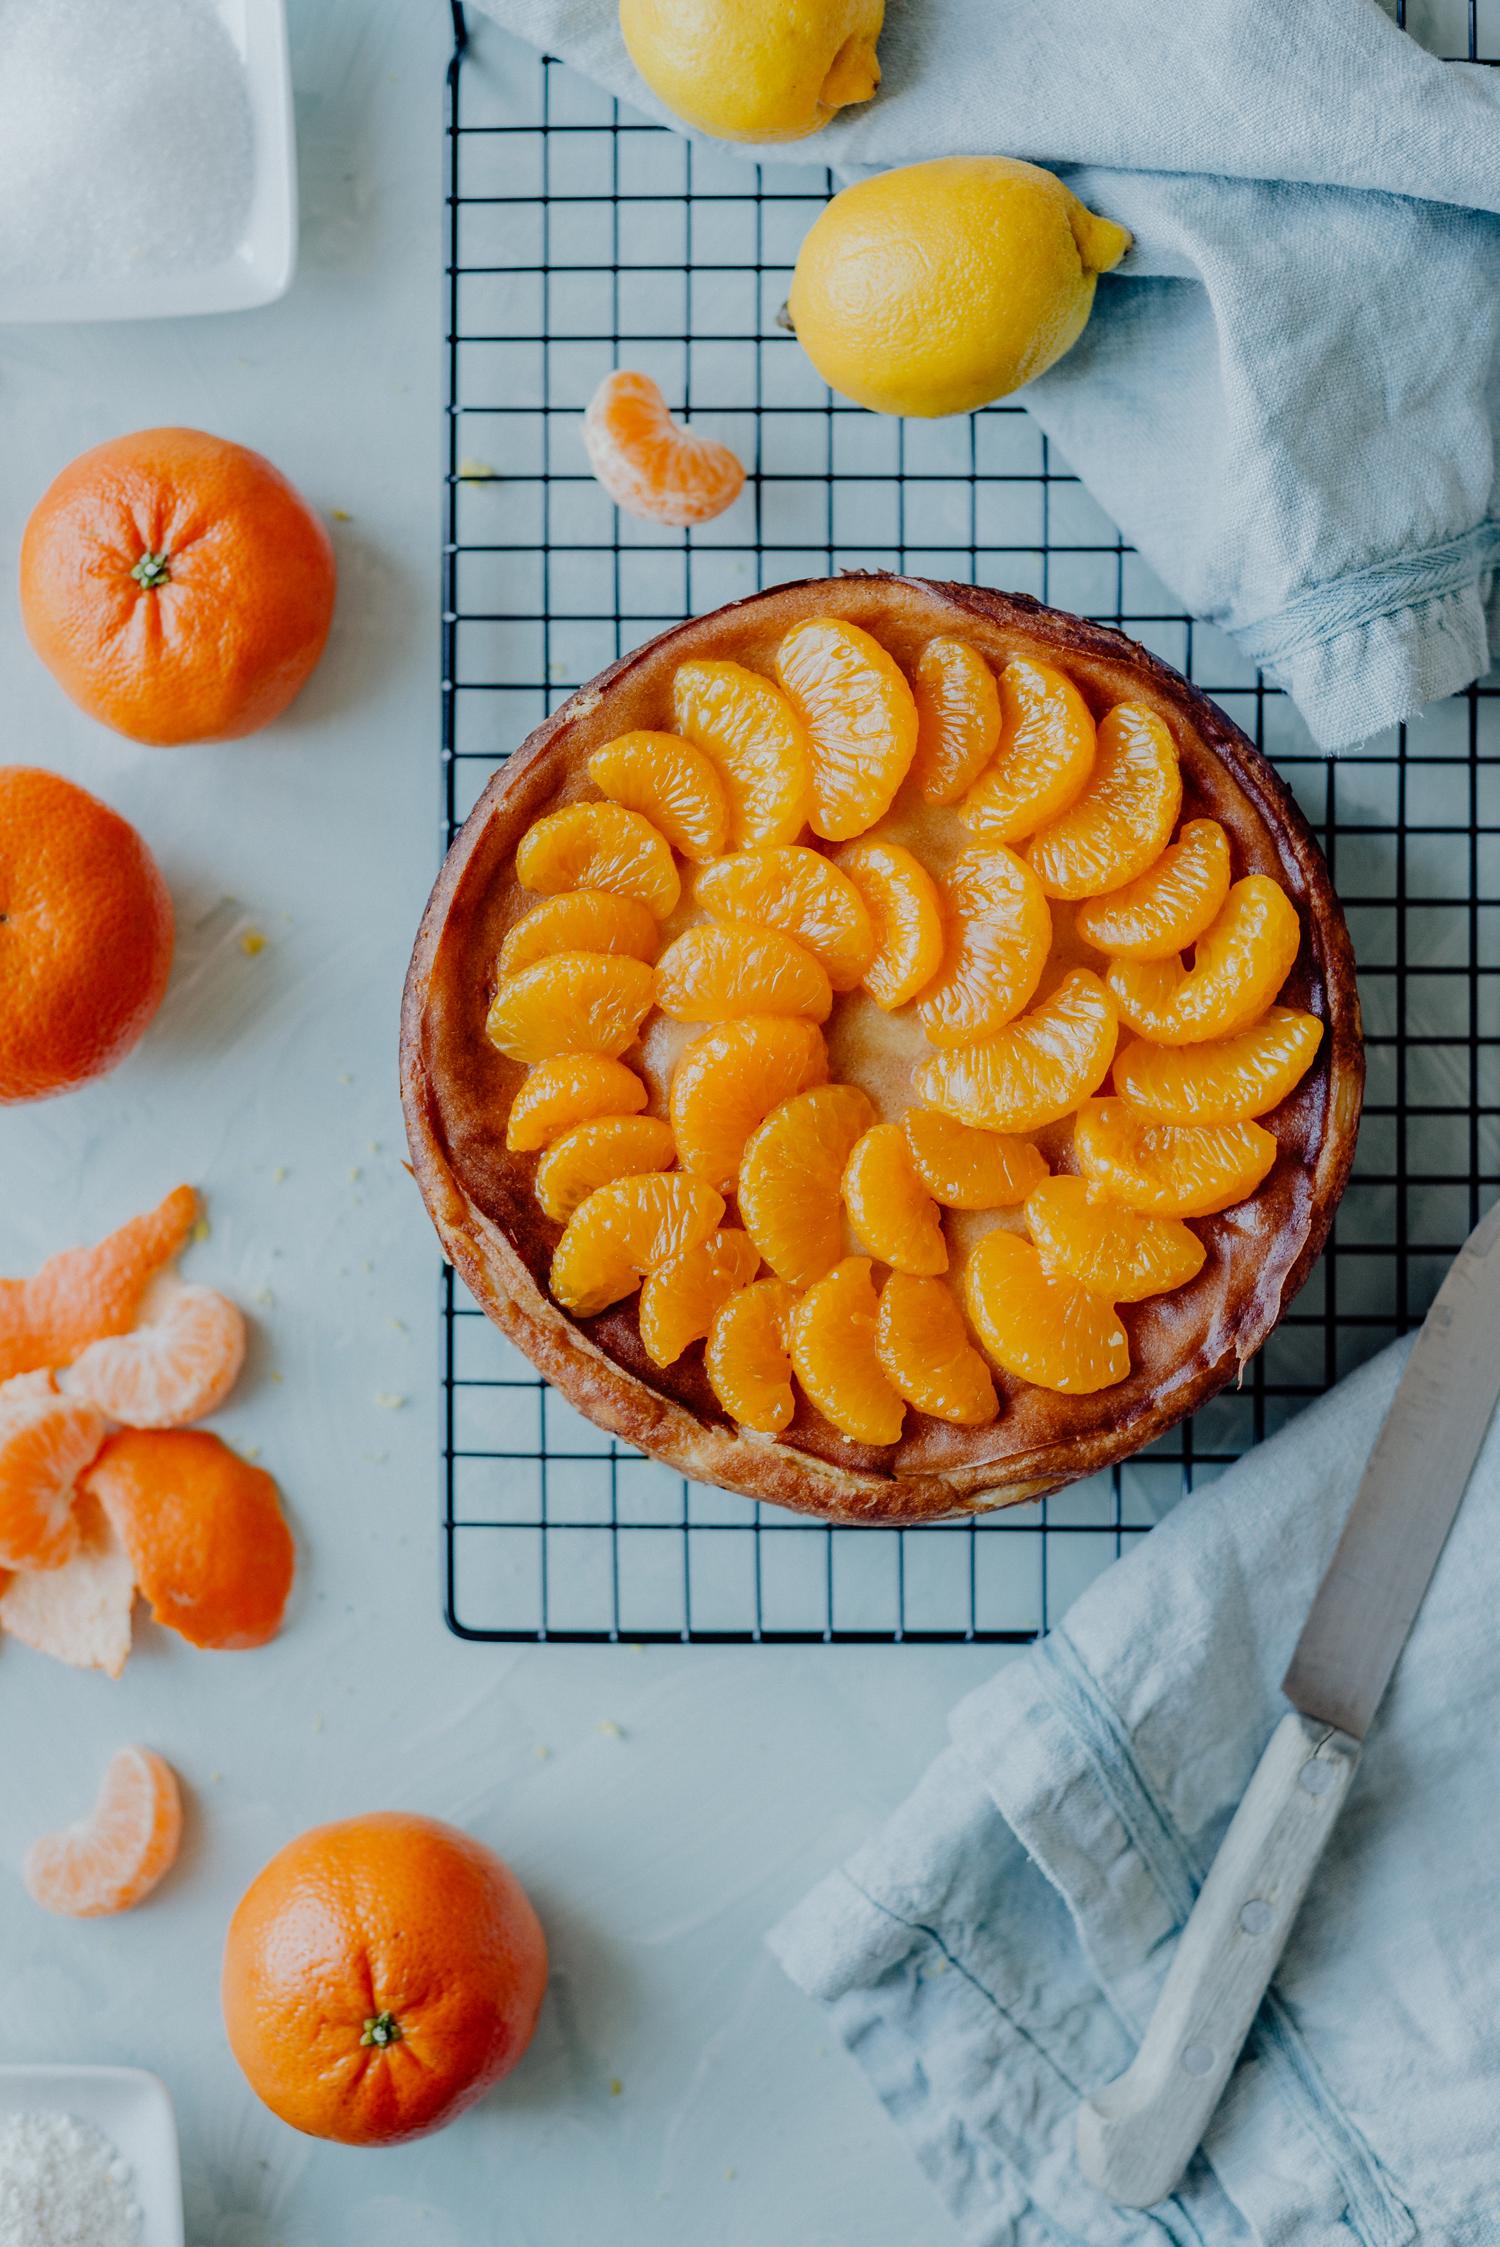 simone-fuerst-fotografie-food-vegan-kaesekuchen